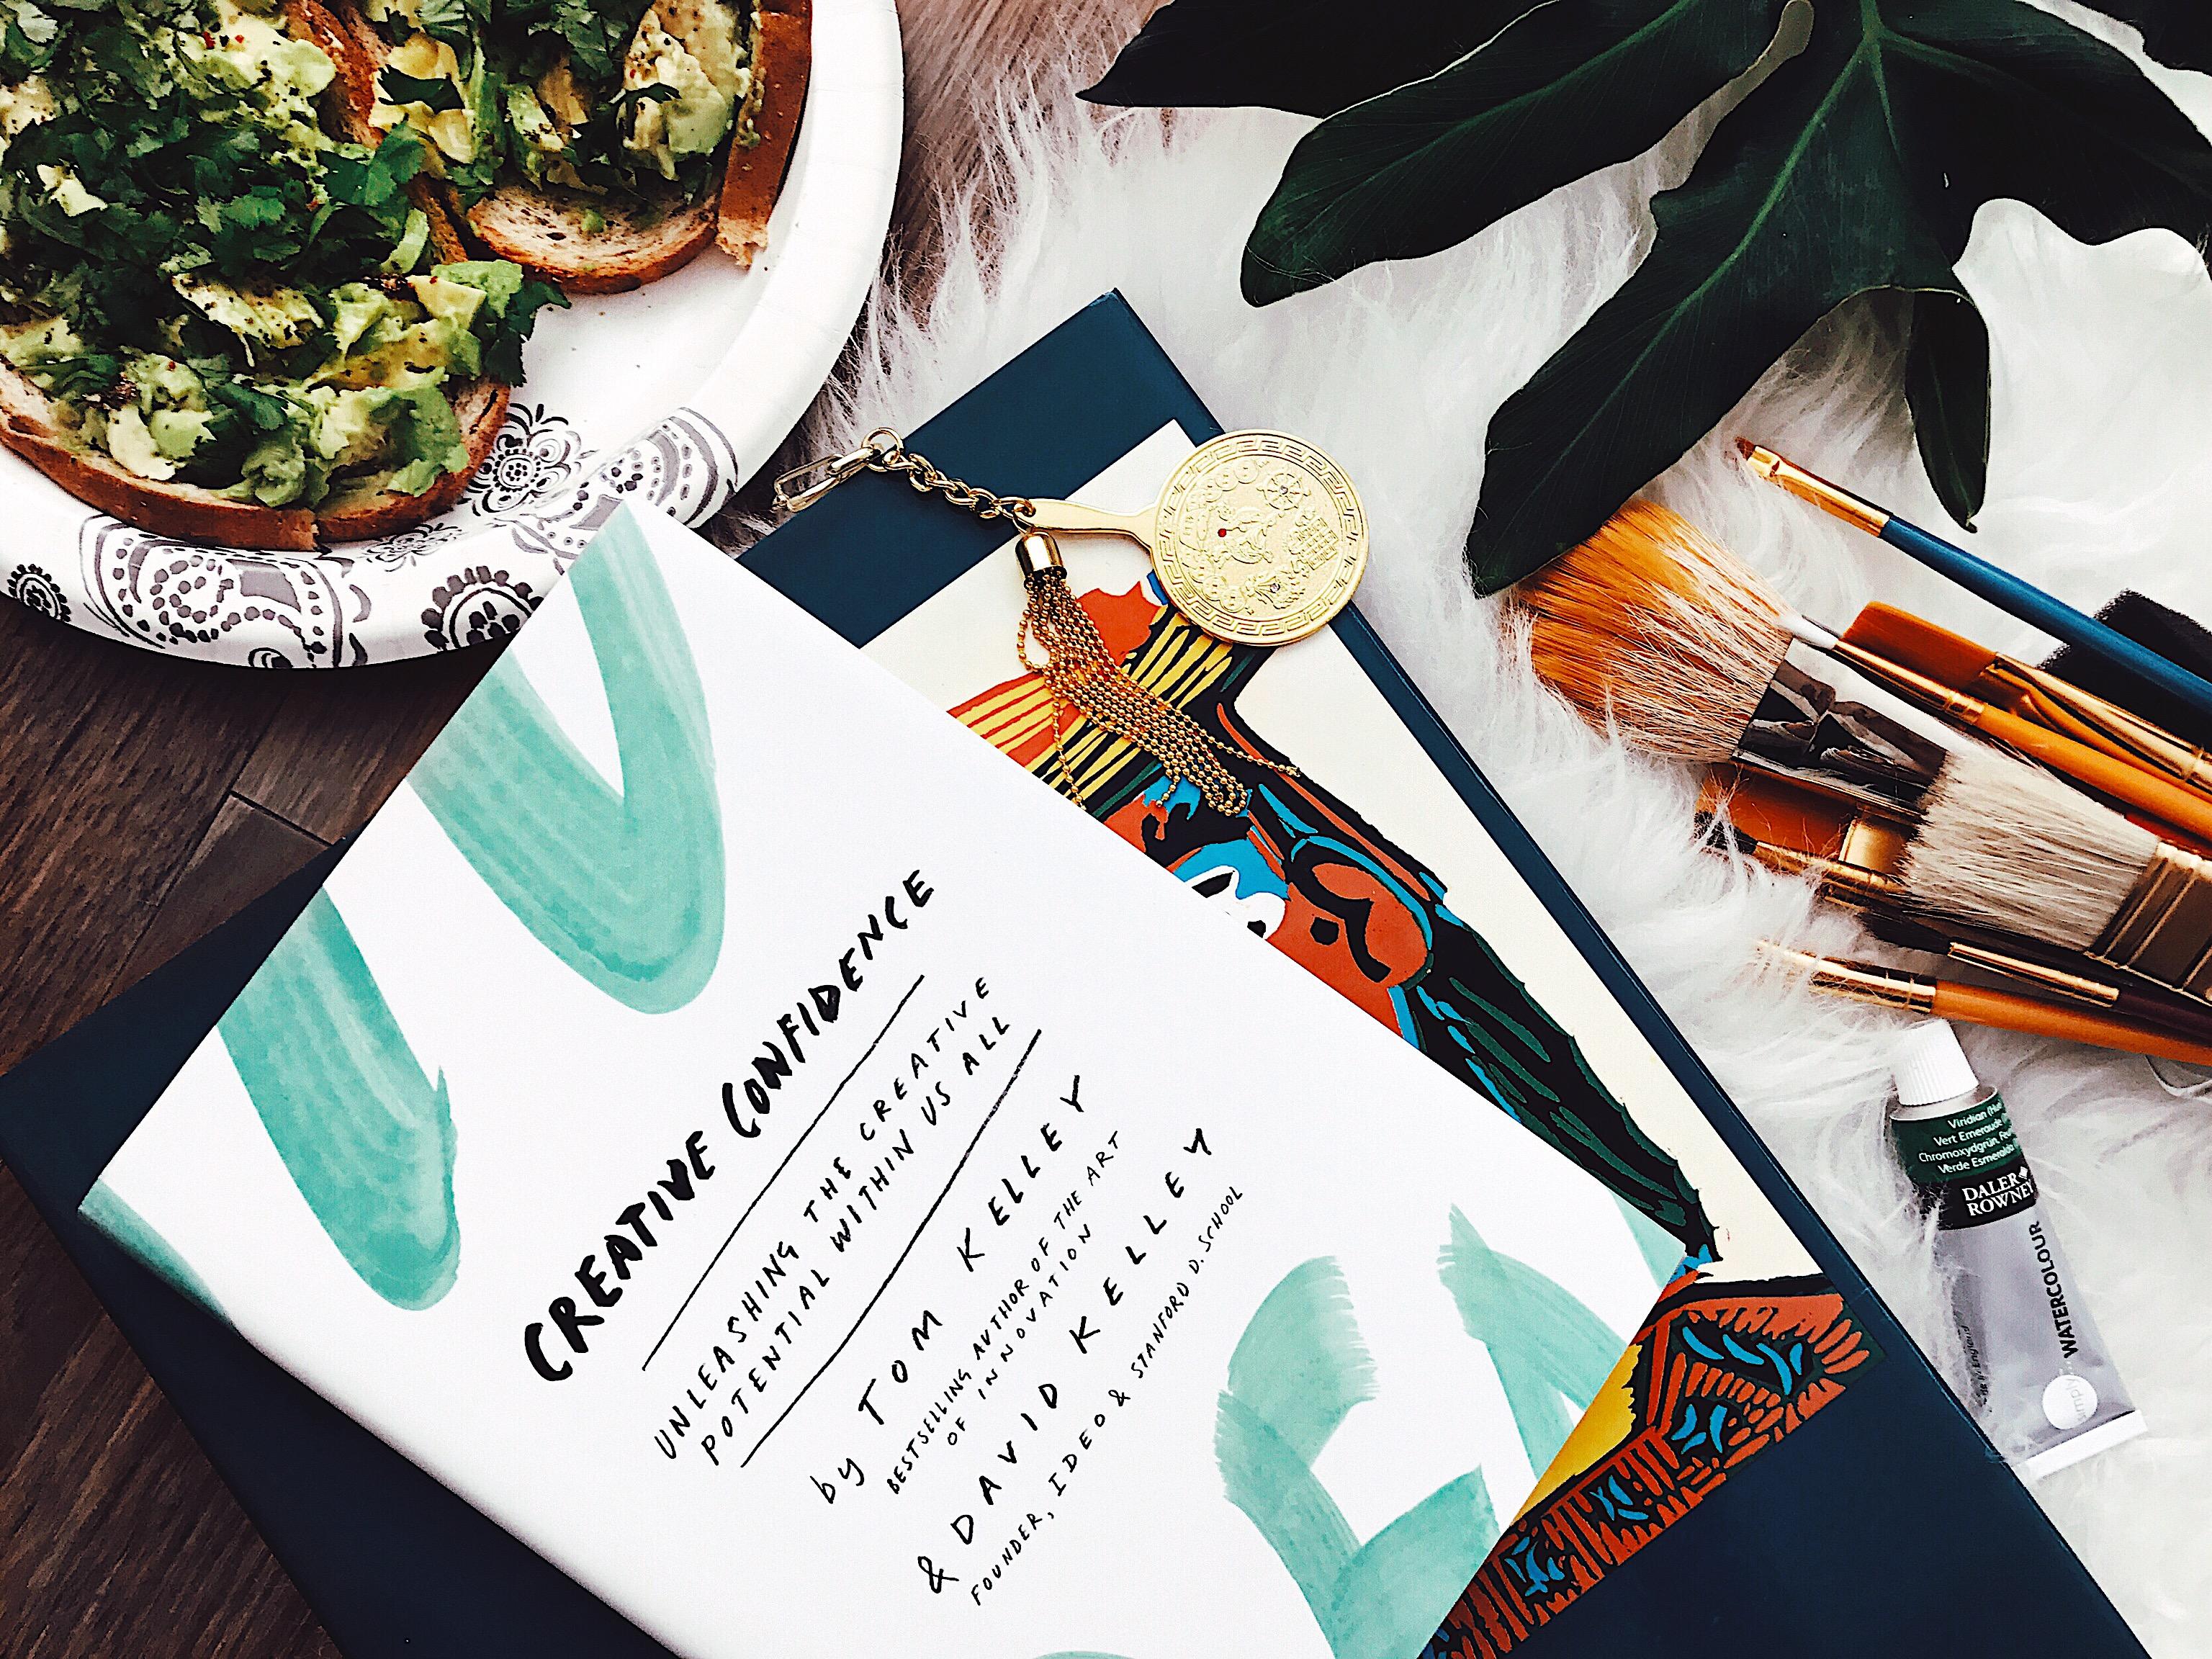 Avocado Toast Creative Confidence and Art Books